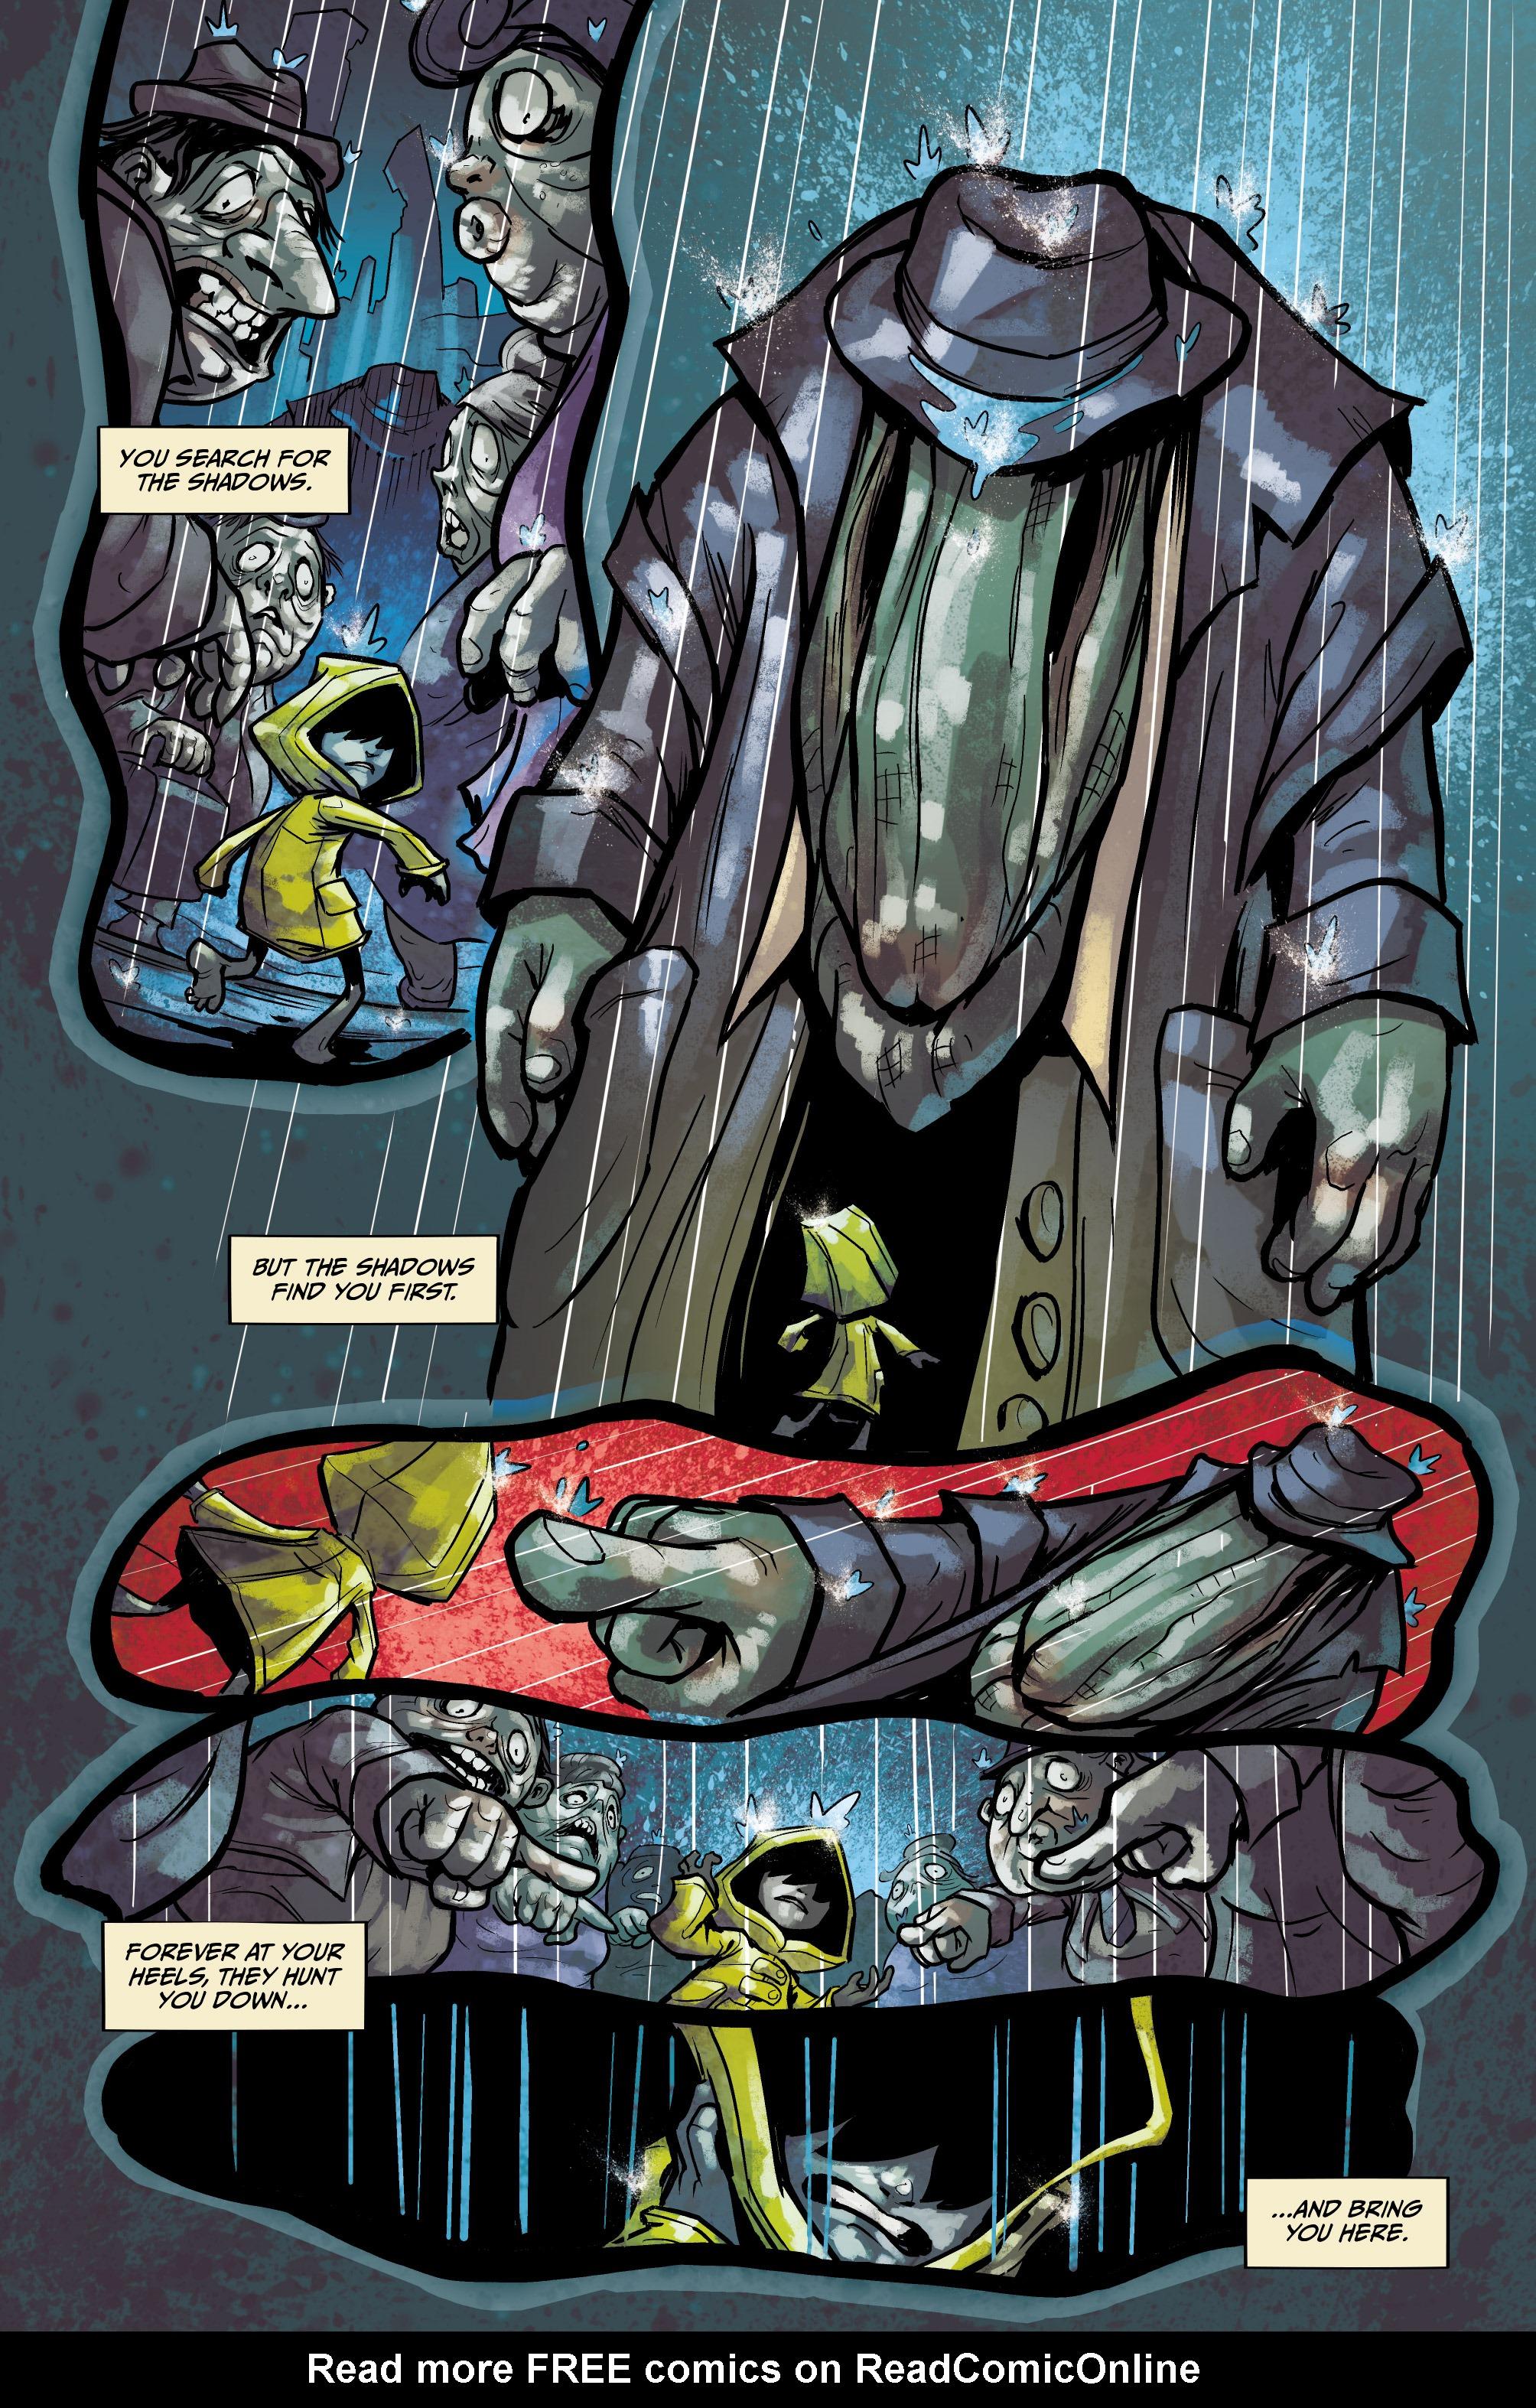 Read online Little Nightmares comic -  Issue #1 - 6